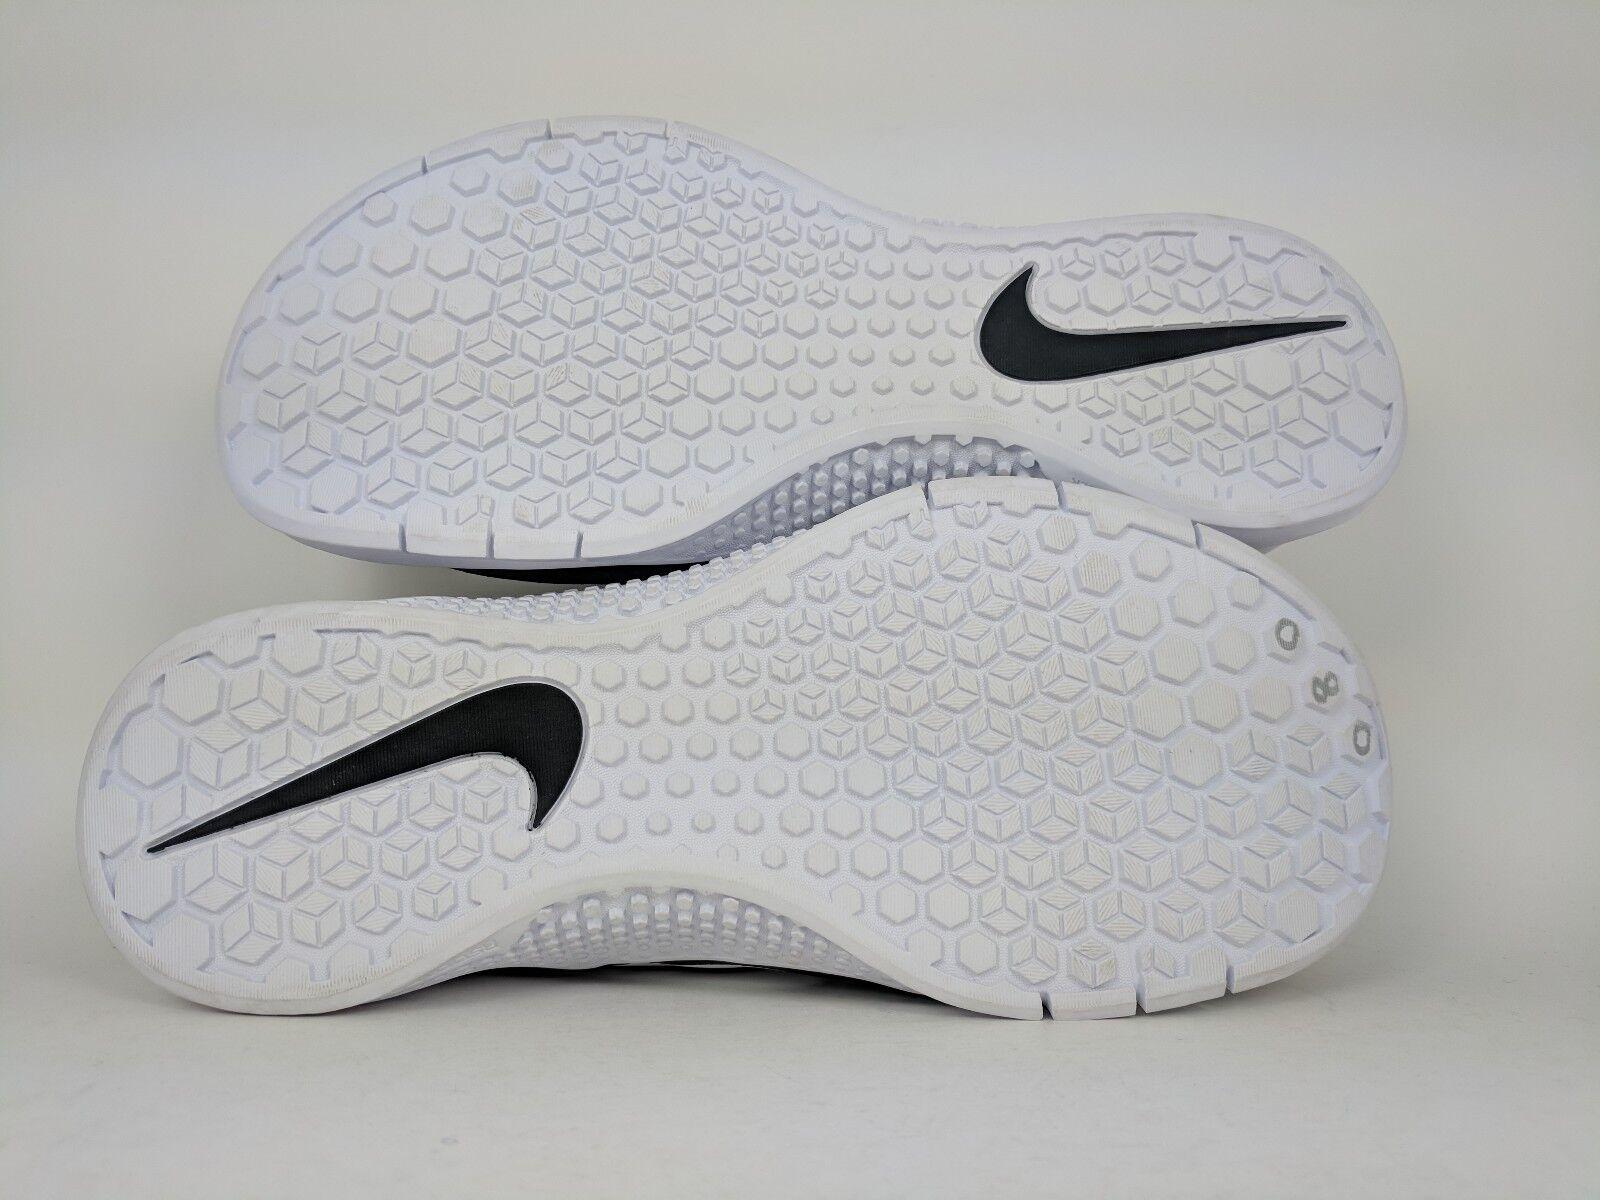 check out d1f18 e5caa ... Nike Men s Metcon 1 AMP PX Training Crossfit Shoes Shoes Shoes Black  White Sz 7 ...